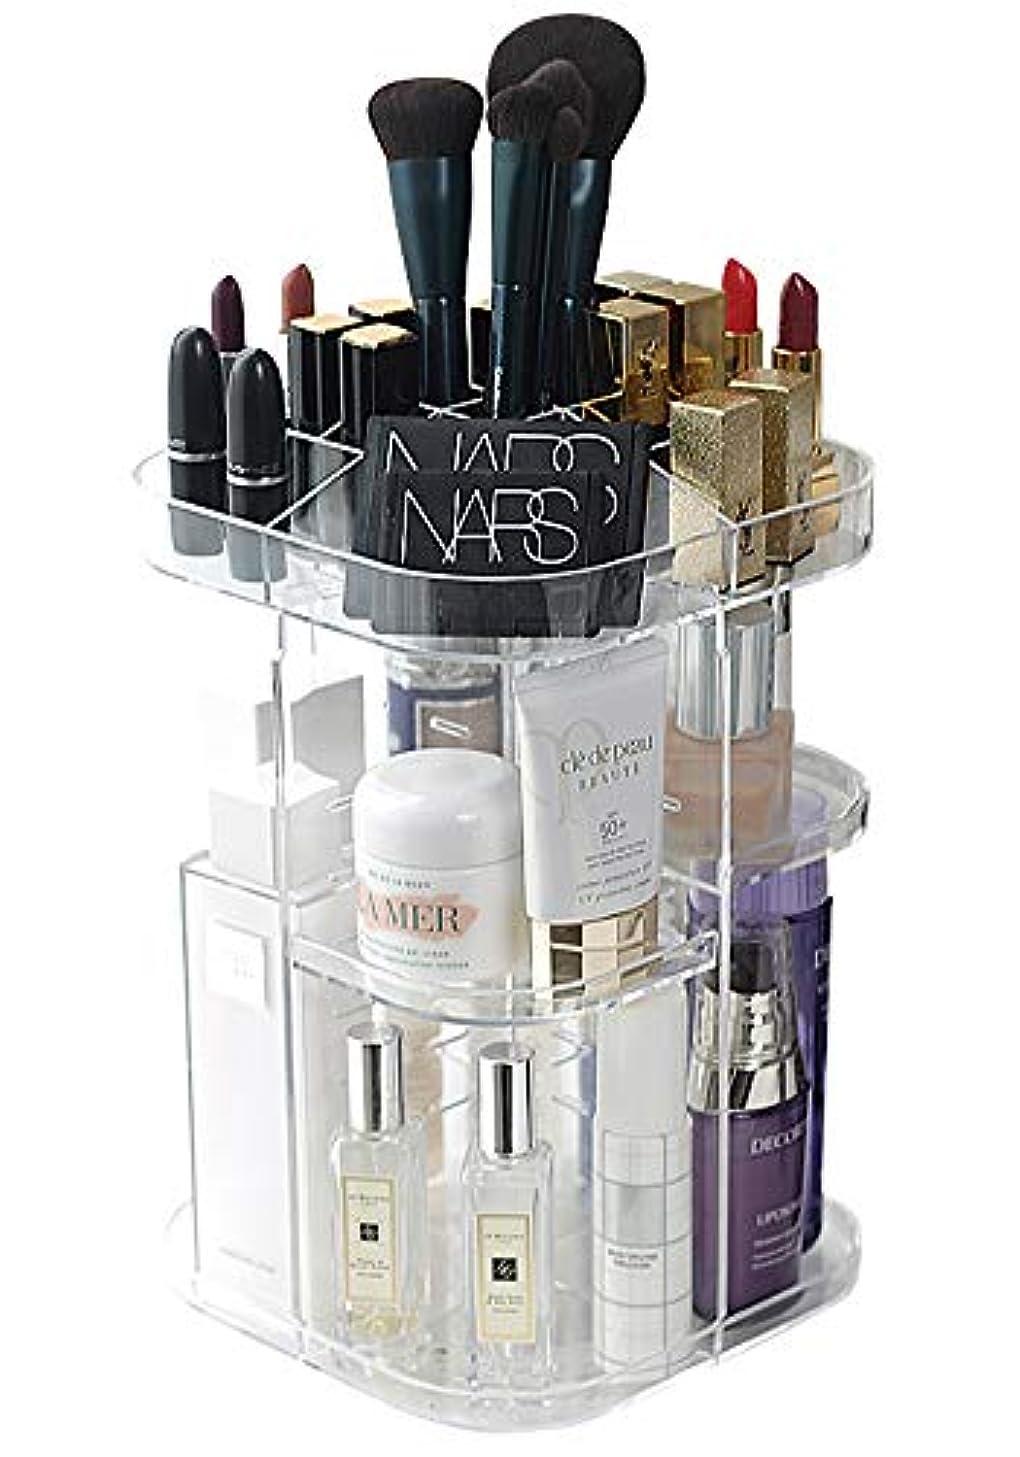 BEREAM 化粧品 スタンド メイク ケース コスメ ボックス 透明 化粧 メイク道具 収納 360度 回転式 小物 収納 (クリア/ロングタイプ)